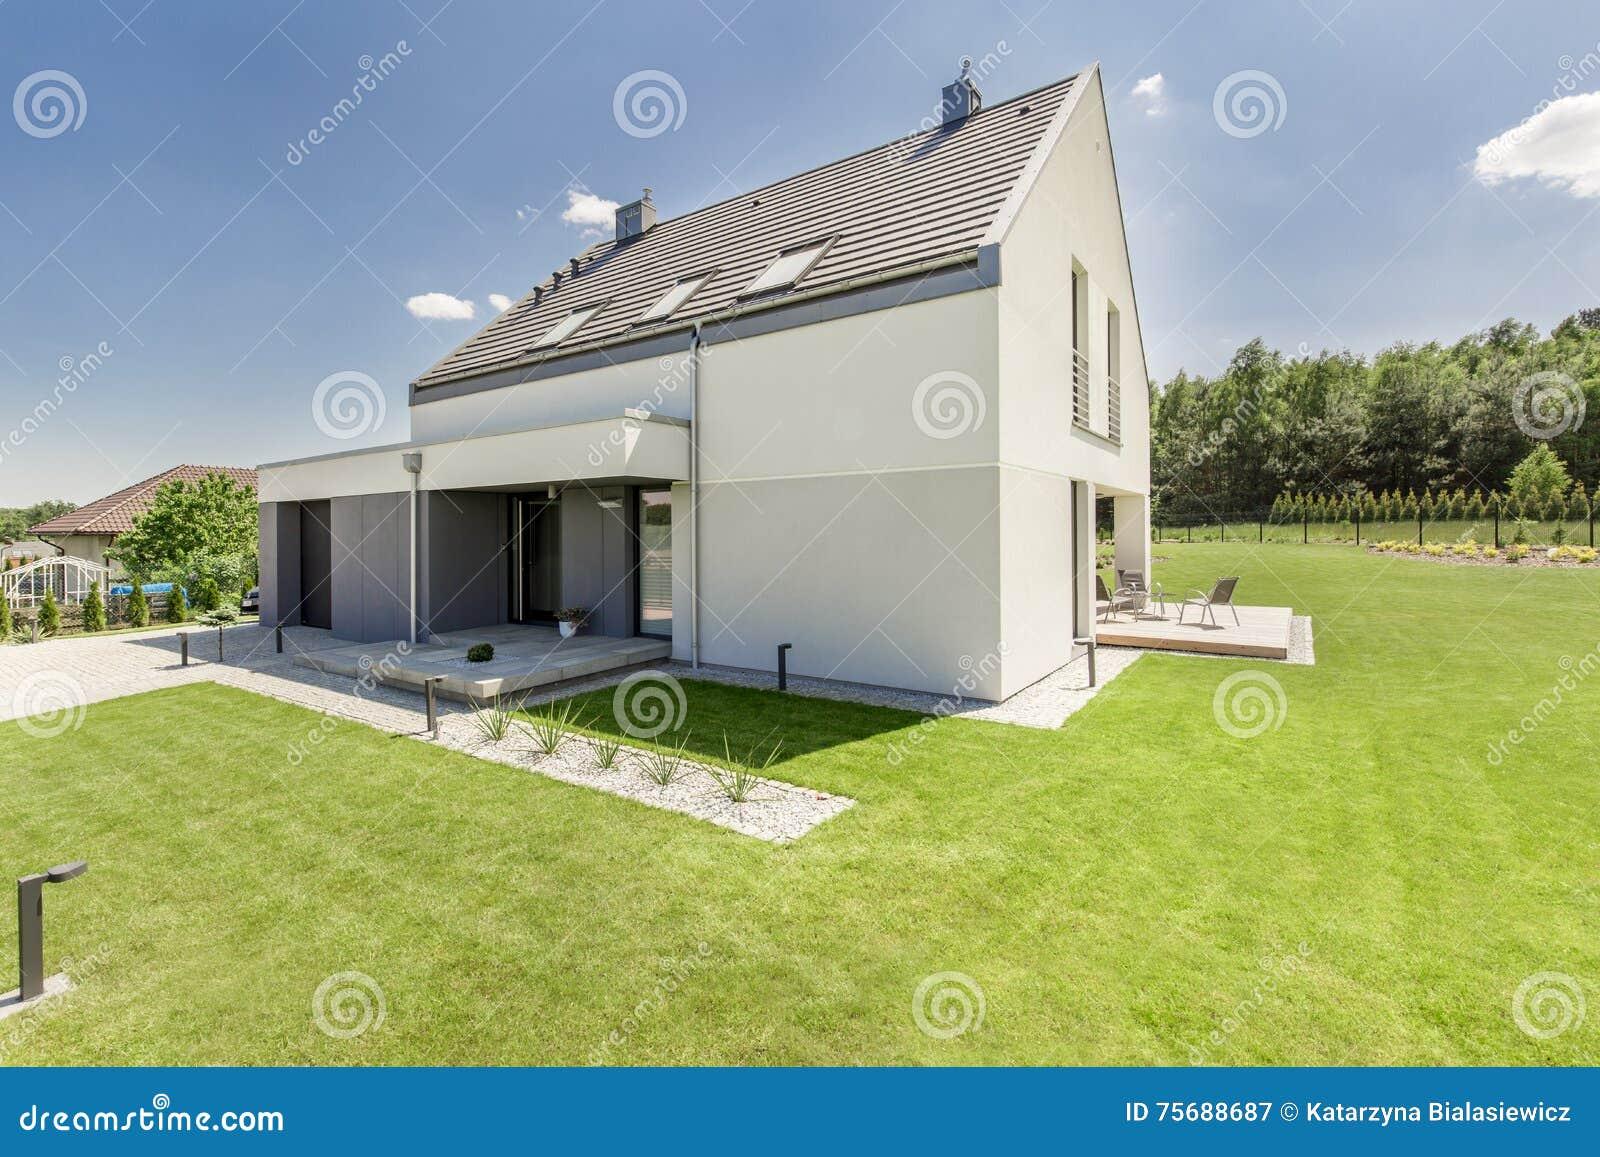 Maison Moderne Simple Image Stock Image Du Vert Jardin 75688687